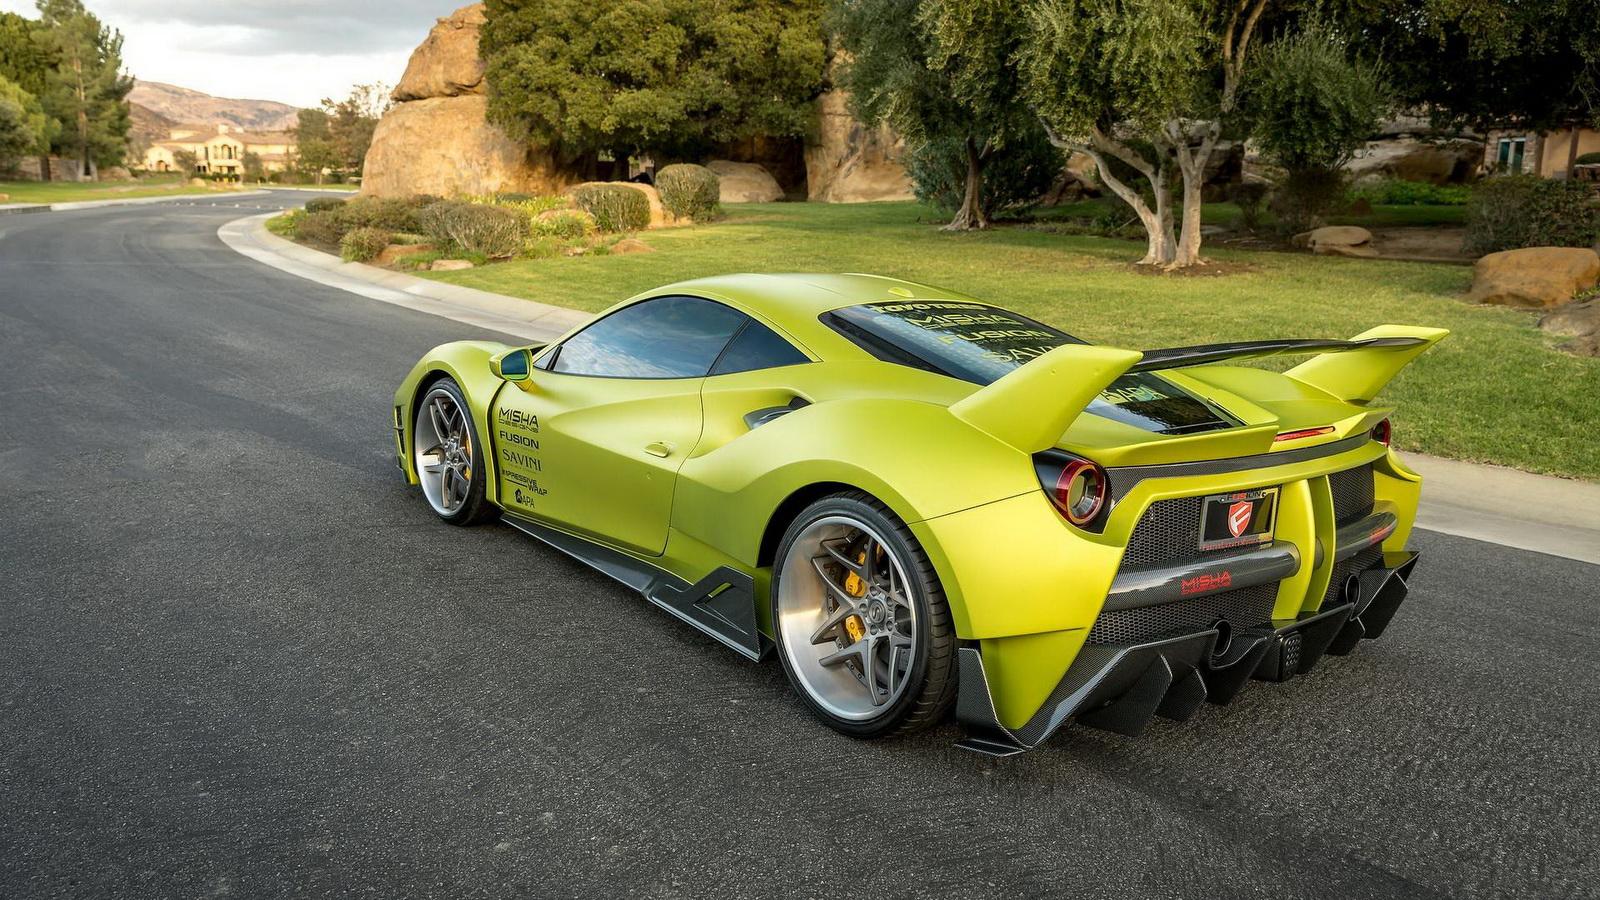 Satin Lime Green Misha Designs Ferrari 488 Is Not Subtle